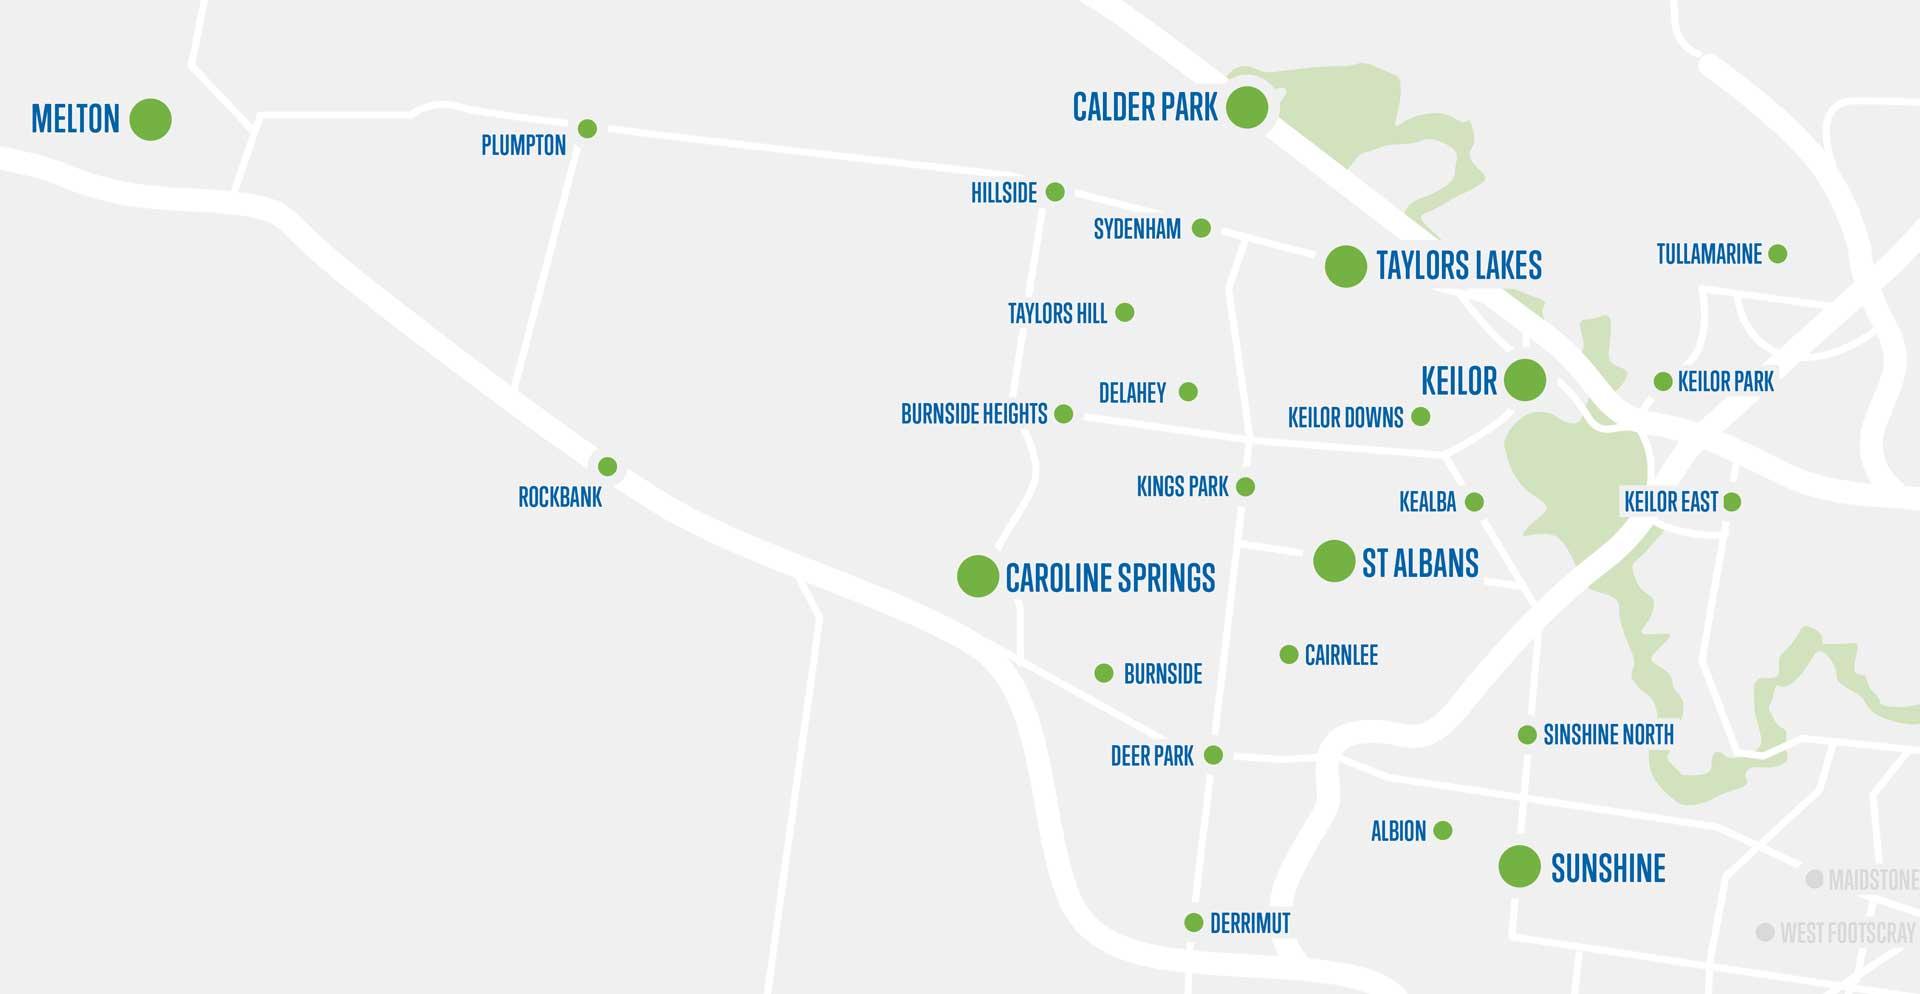 map-melton-area